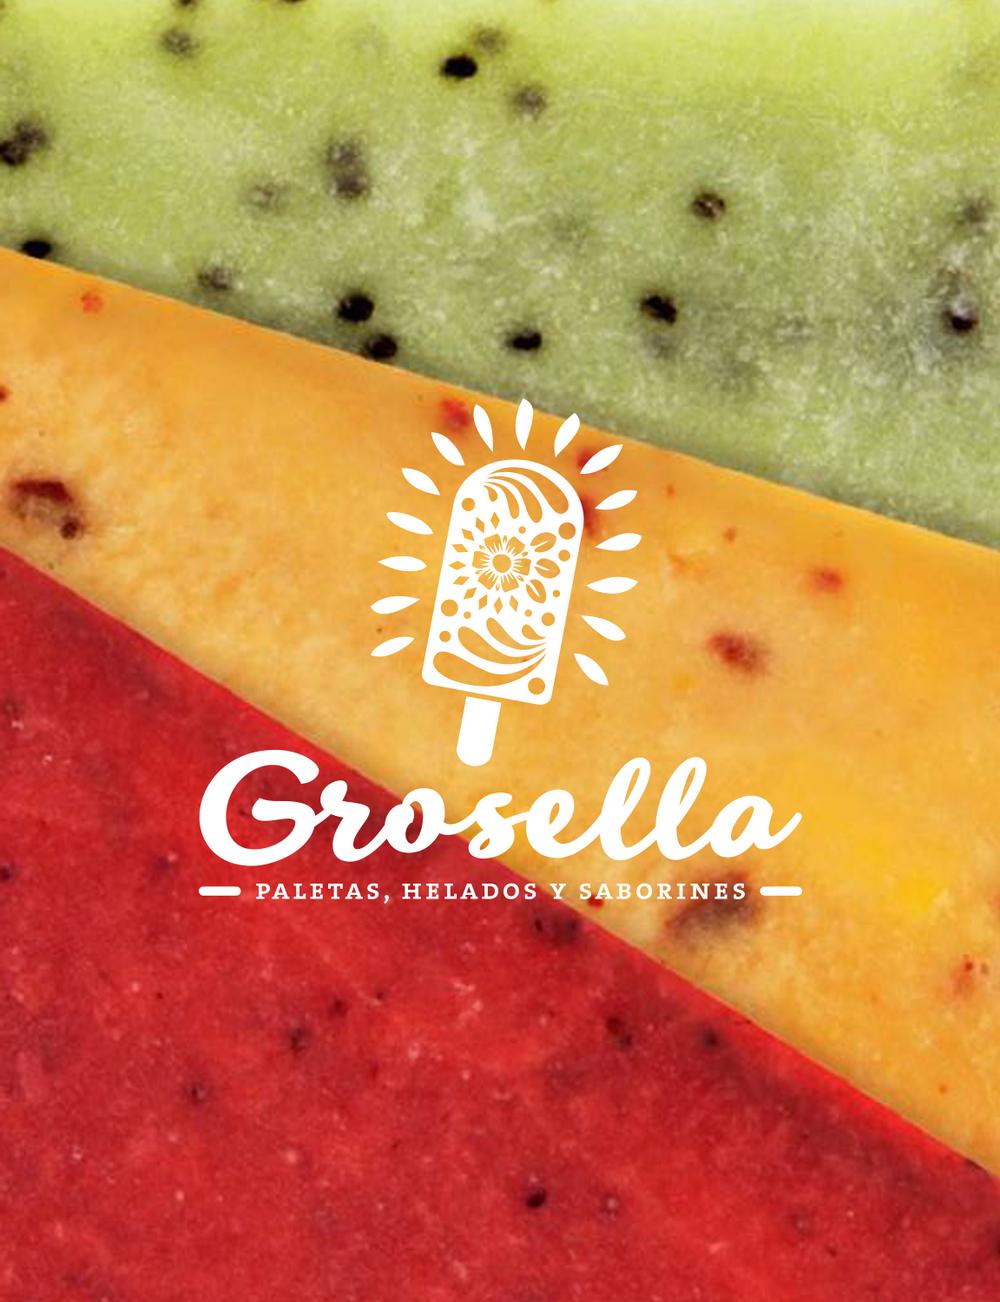 Grosella